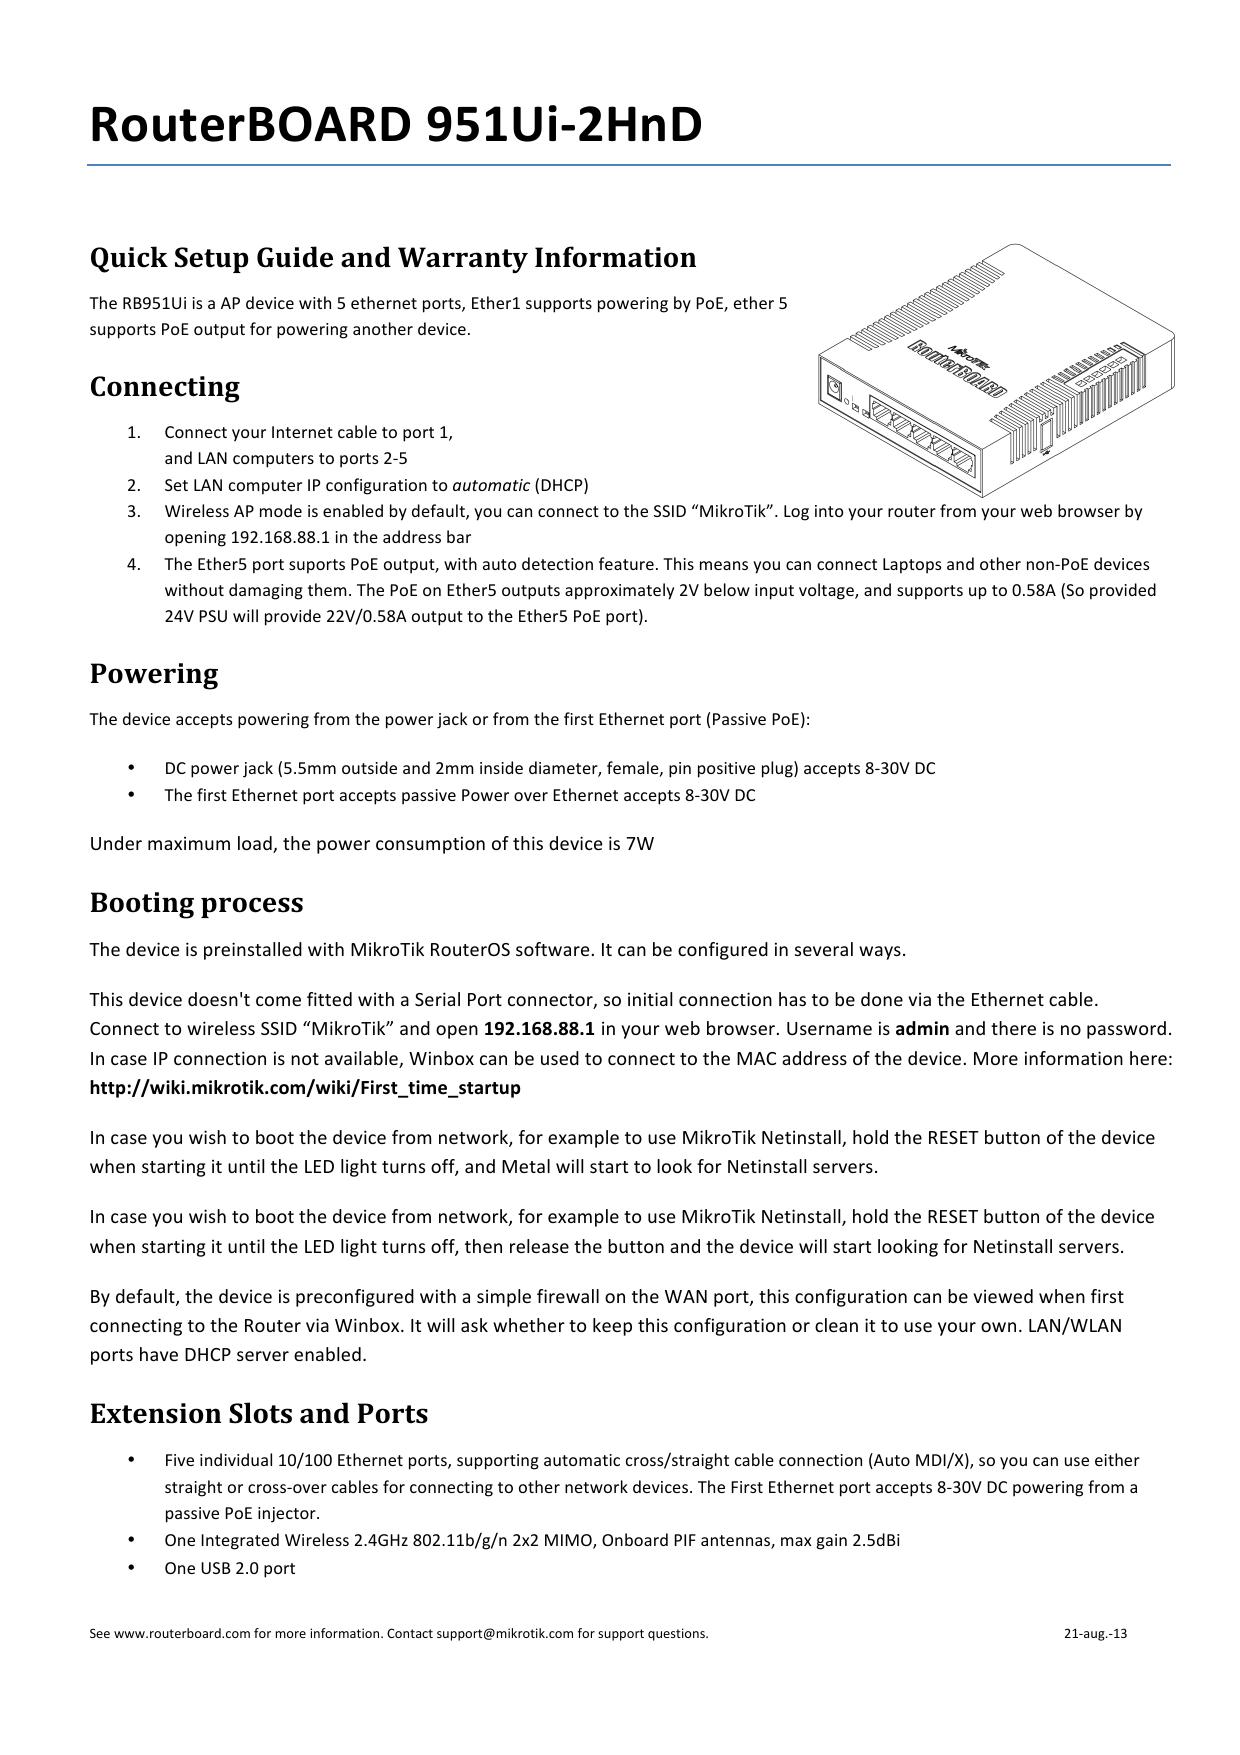 RouterBOARD 951Ui-‐2HnD   manualzz com